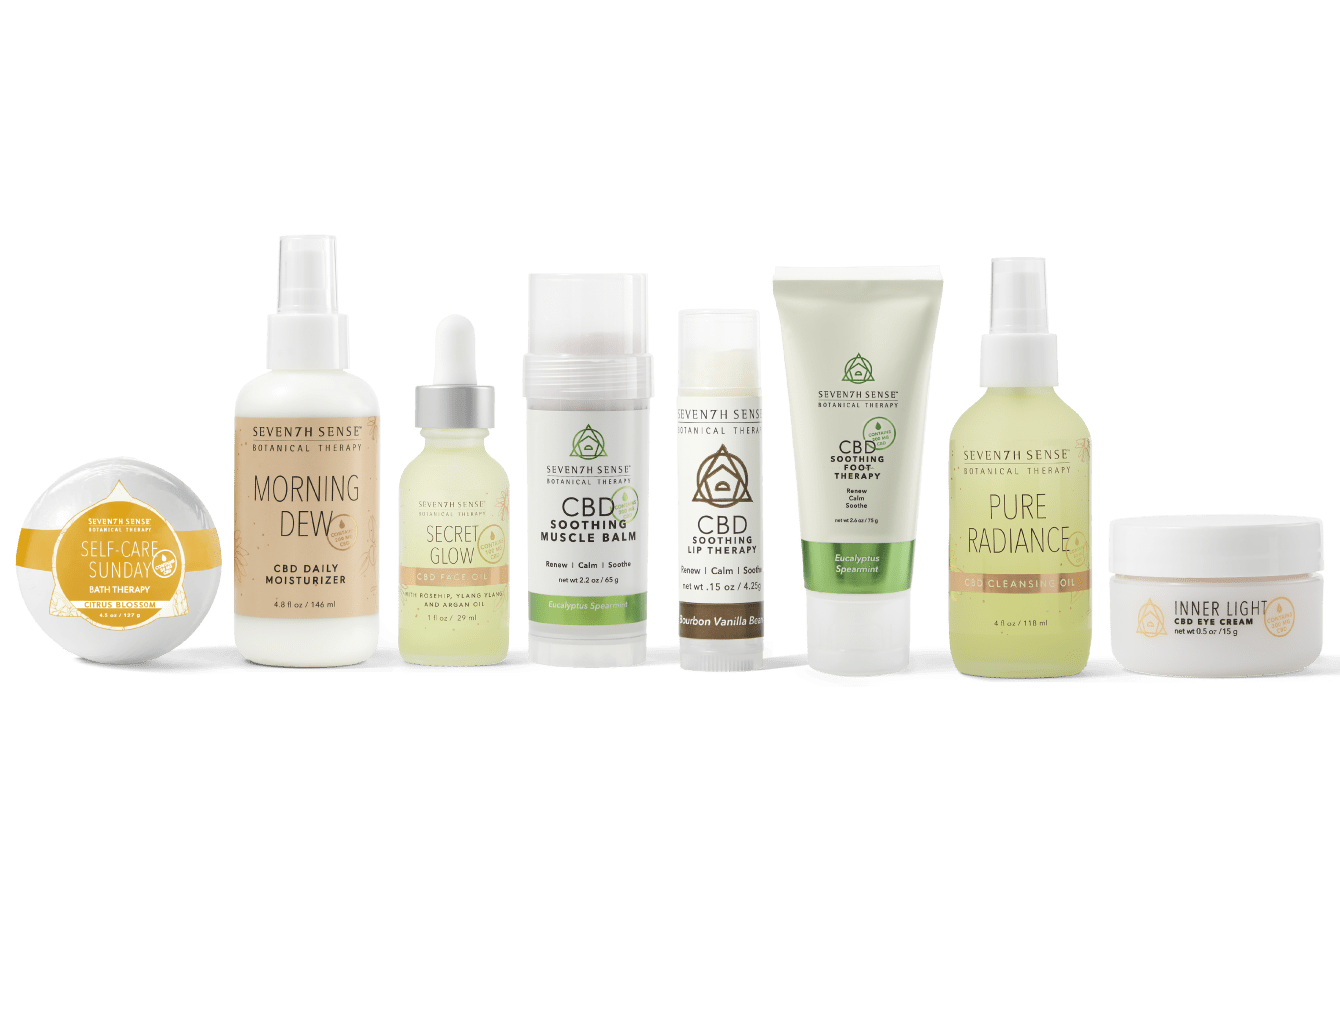 Seventh Sense Botanical Therapy CBD Products